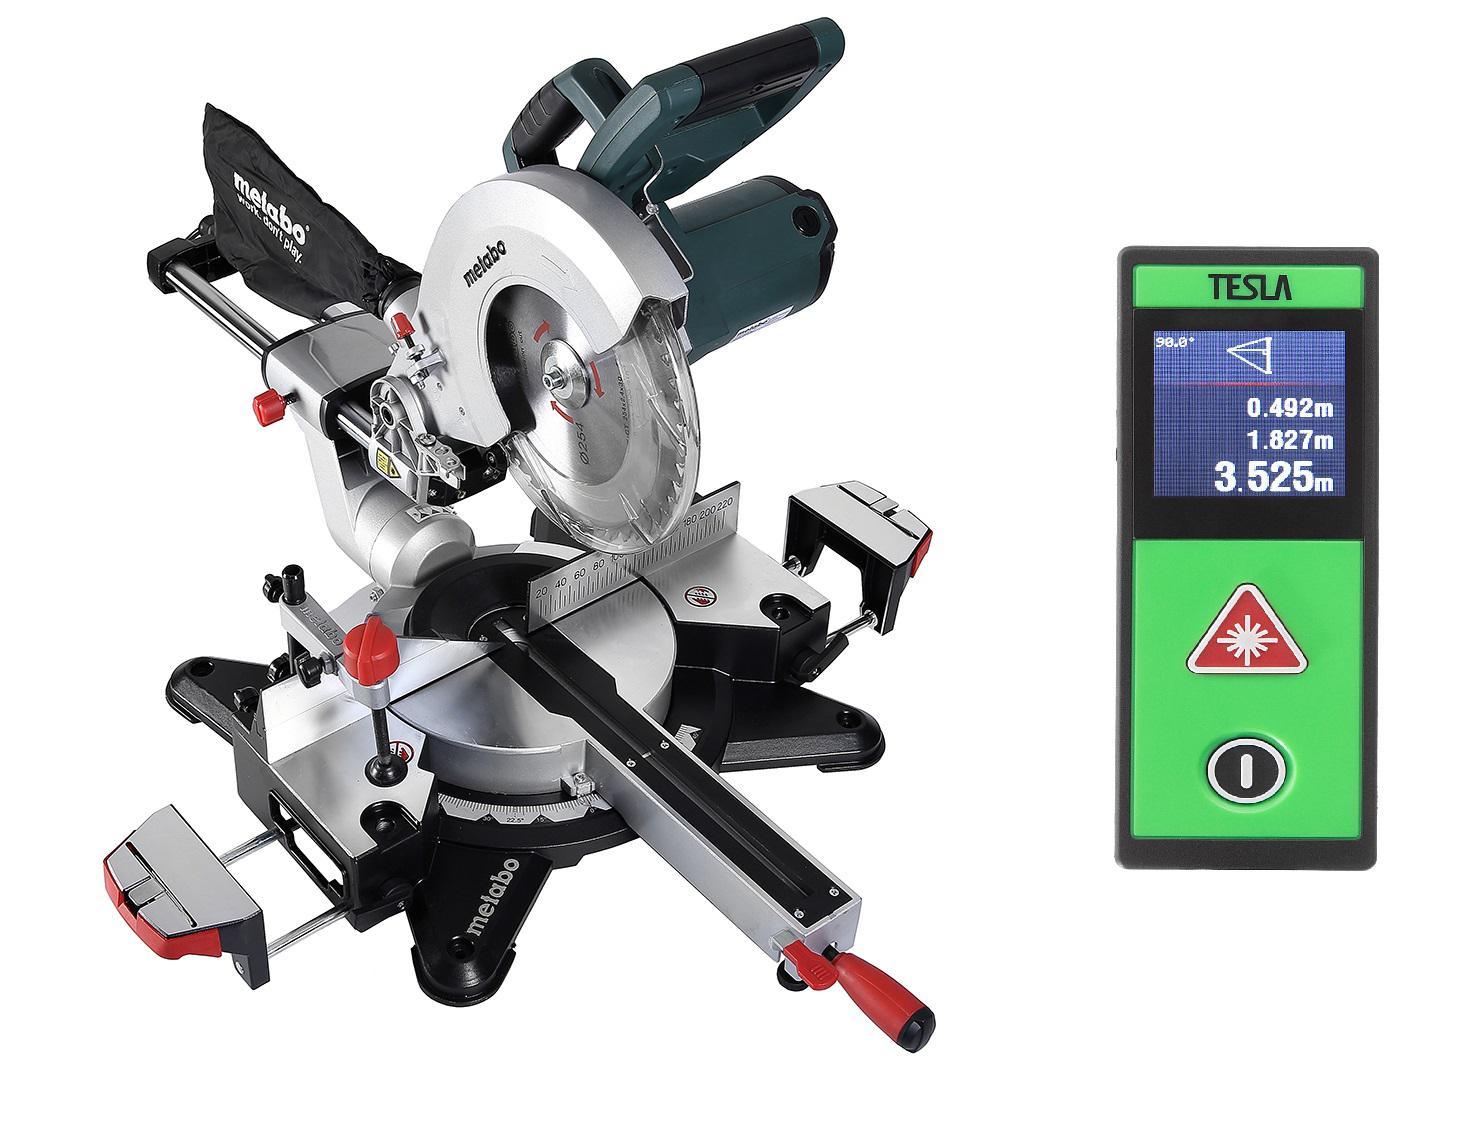 Набор Metabo Пила торцовочная kgs 254 m (602540000) +Дальномер m-40 touch